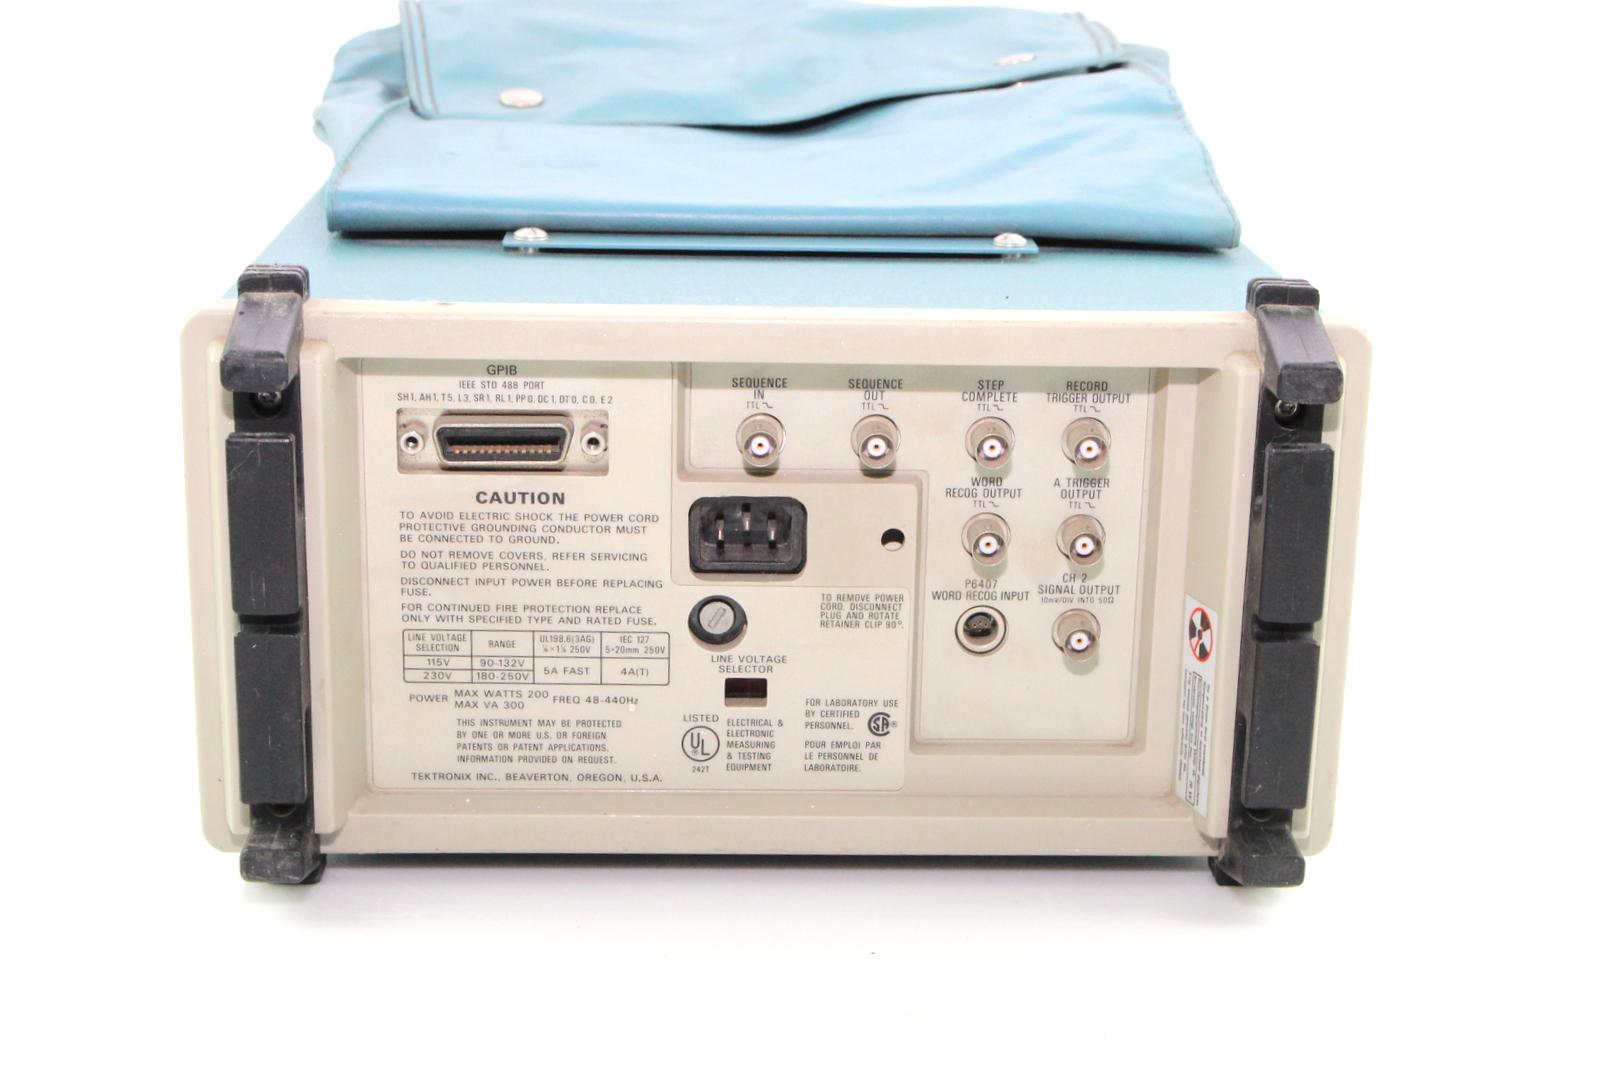 Best Tektronix Oscilloscope : Tektronix a digital oscilloscope ebay